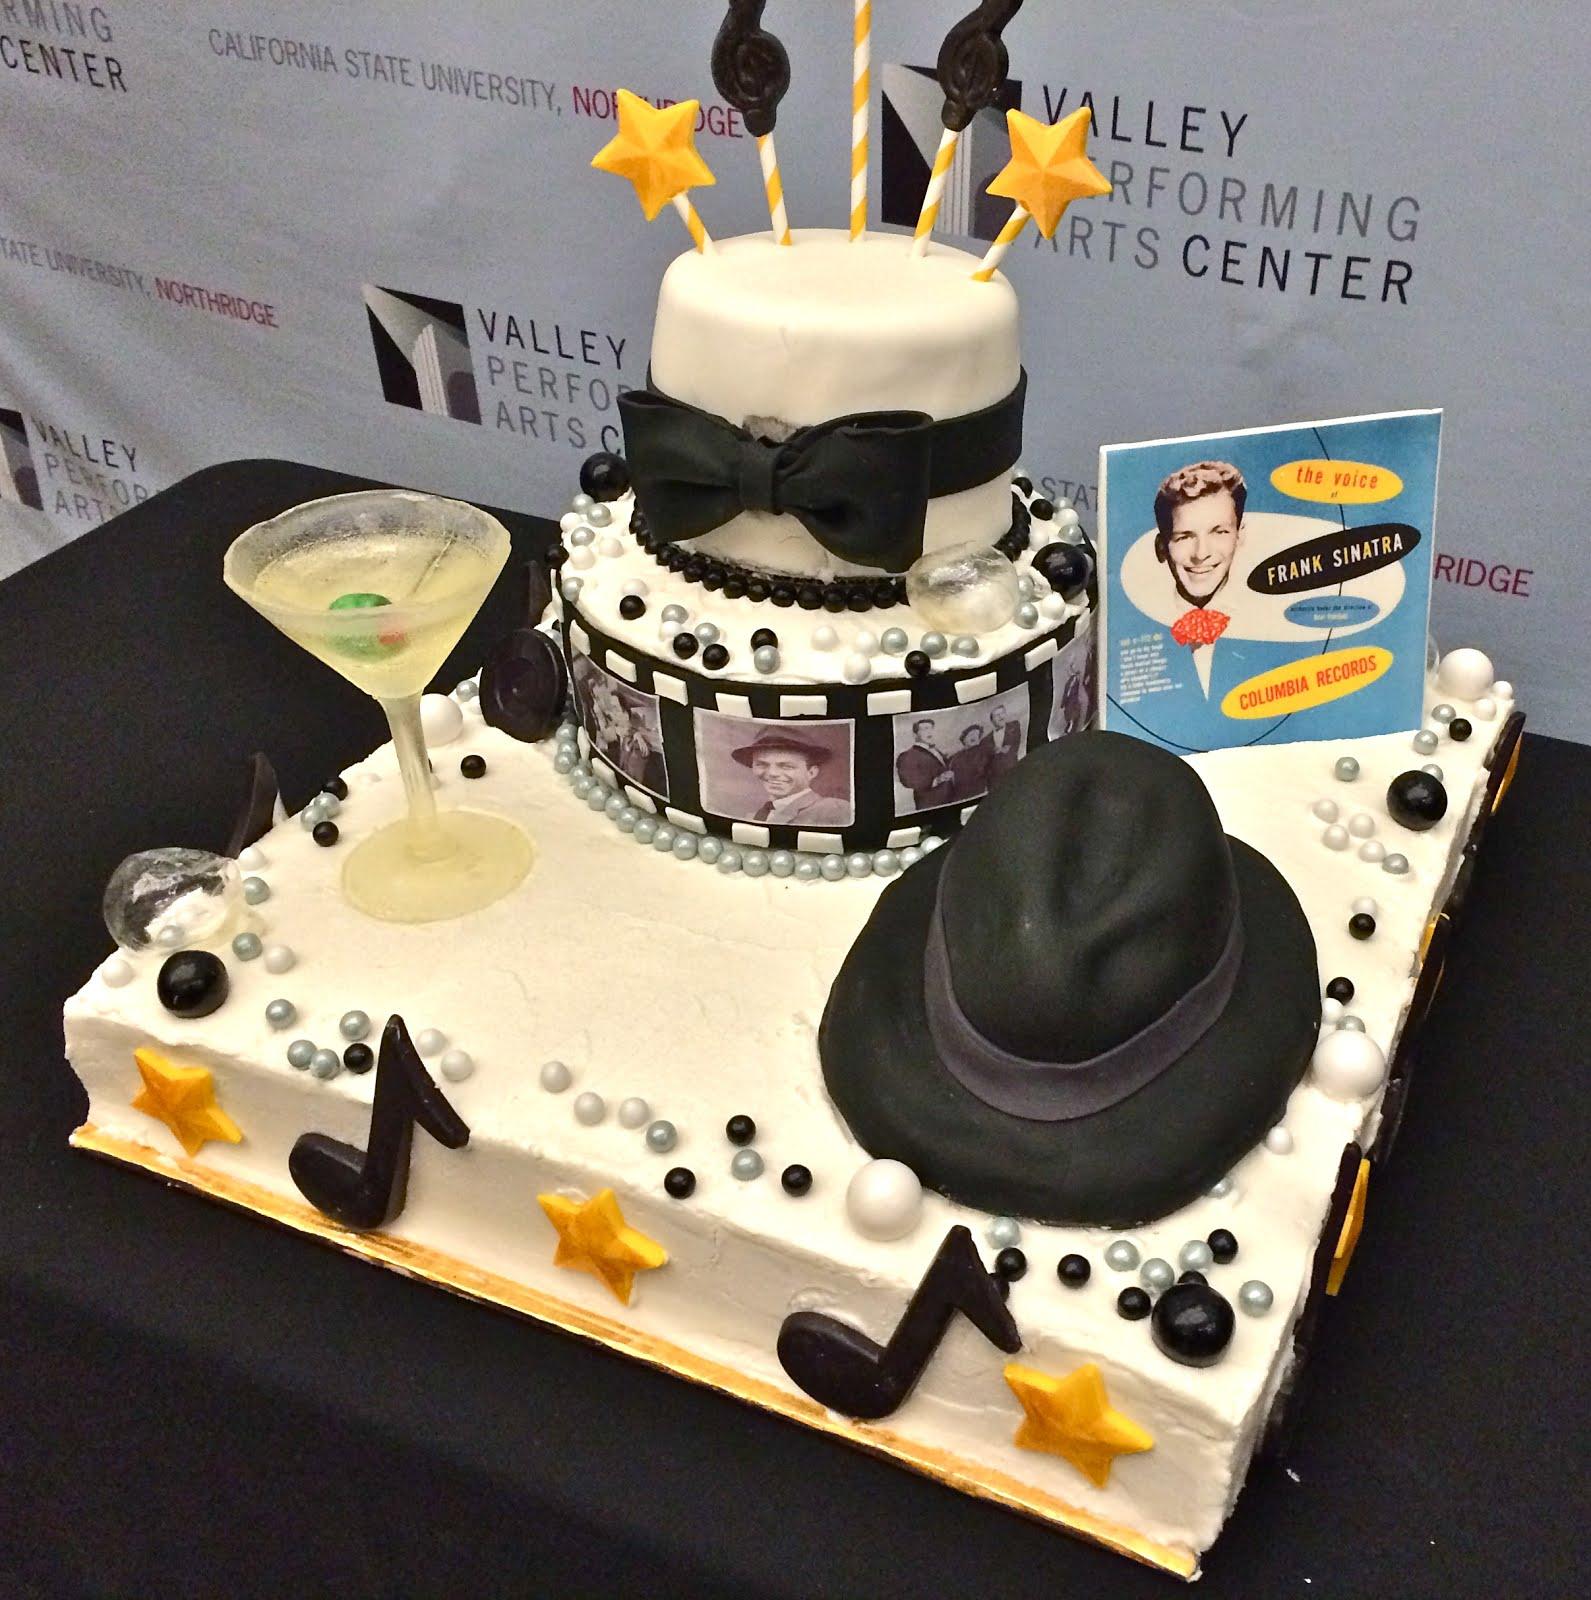 Culver City Po Happy Birthday Frank